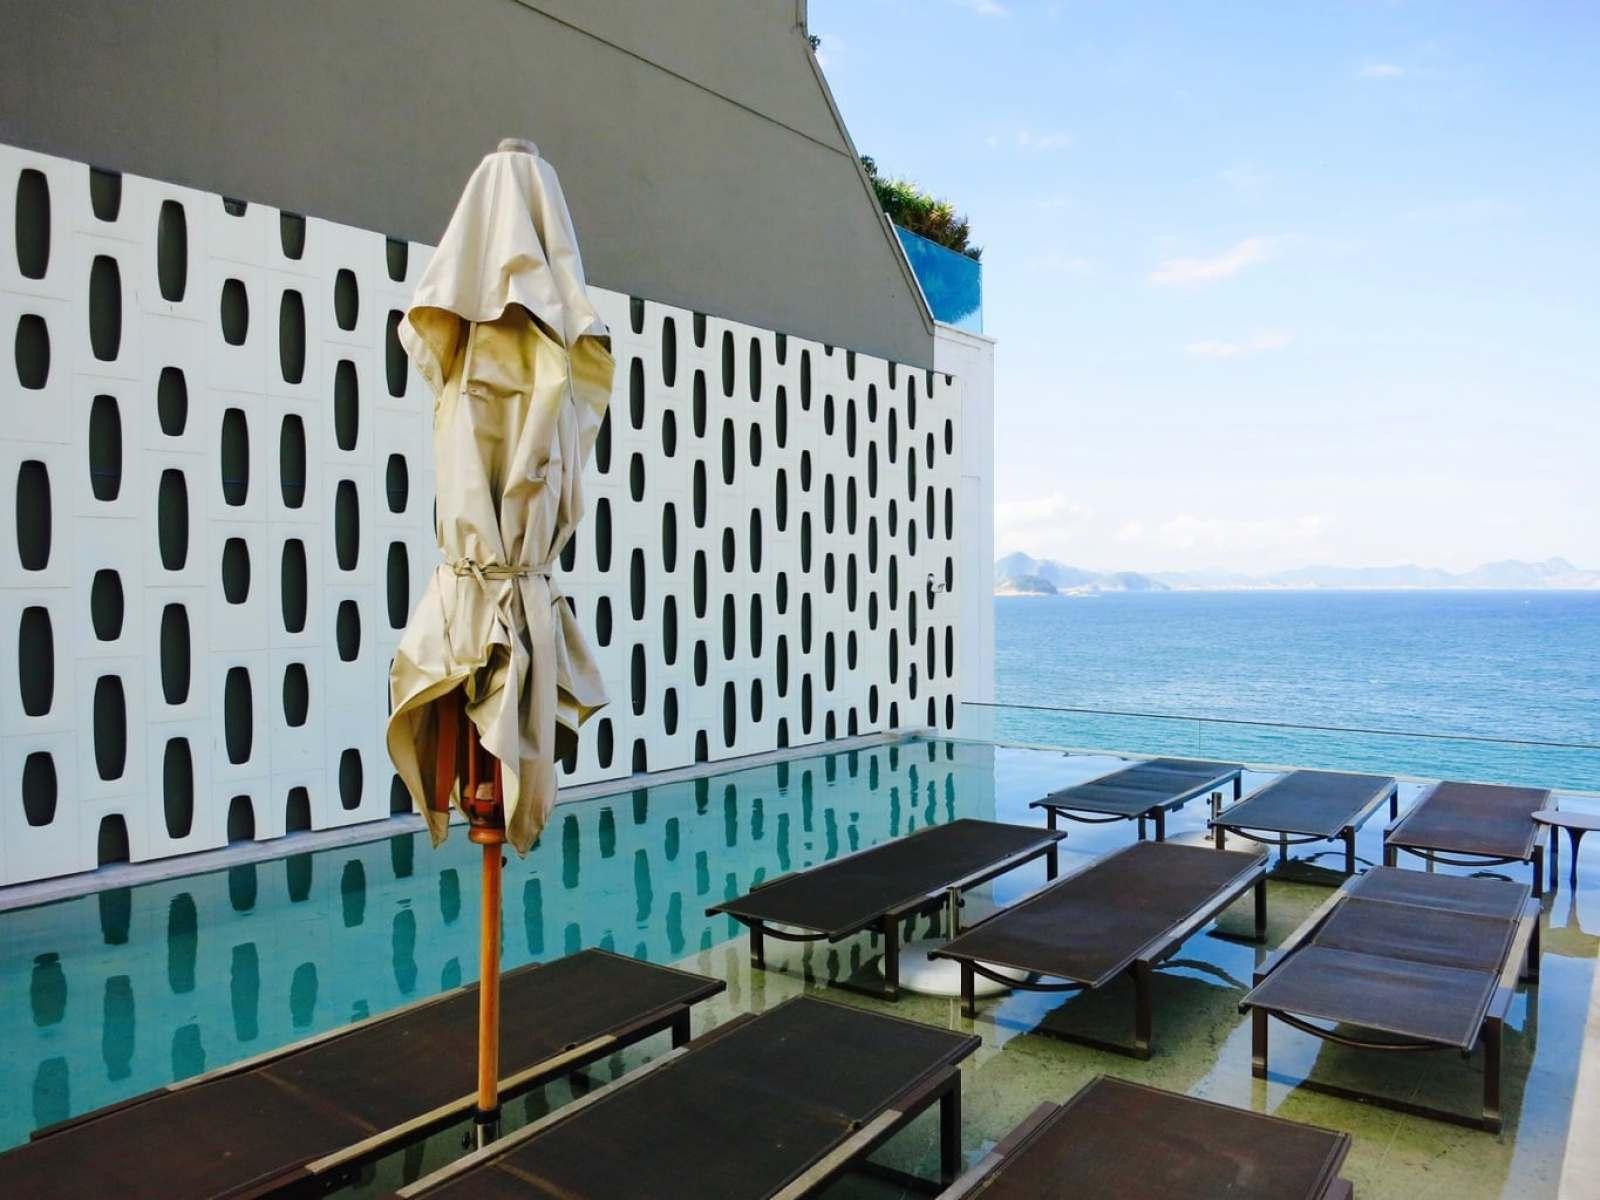 Roof Infinity Pool, Hotel Emiliano Rio Brazil